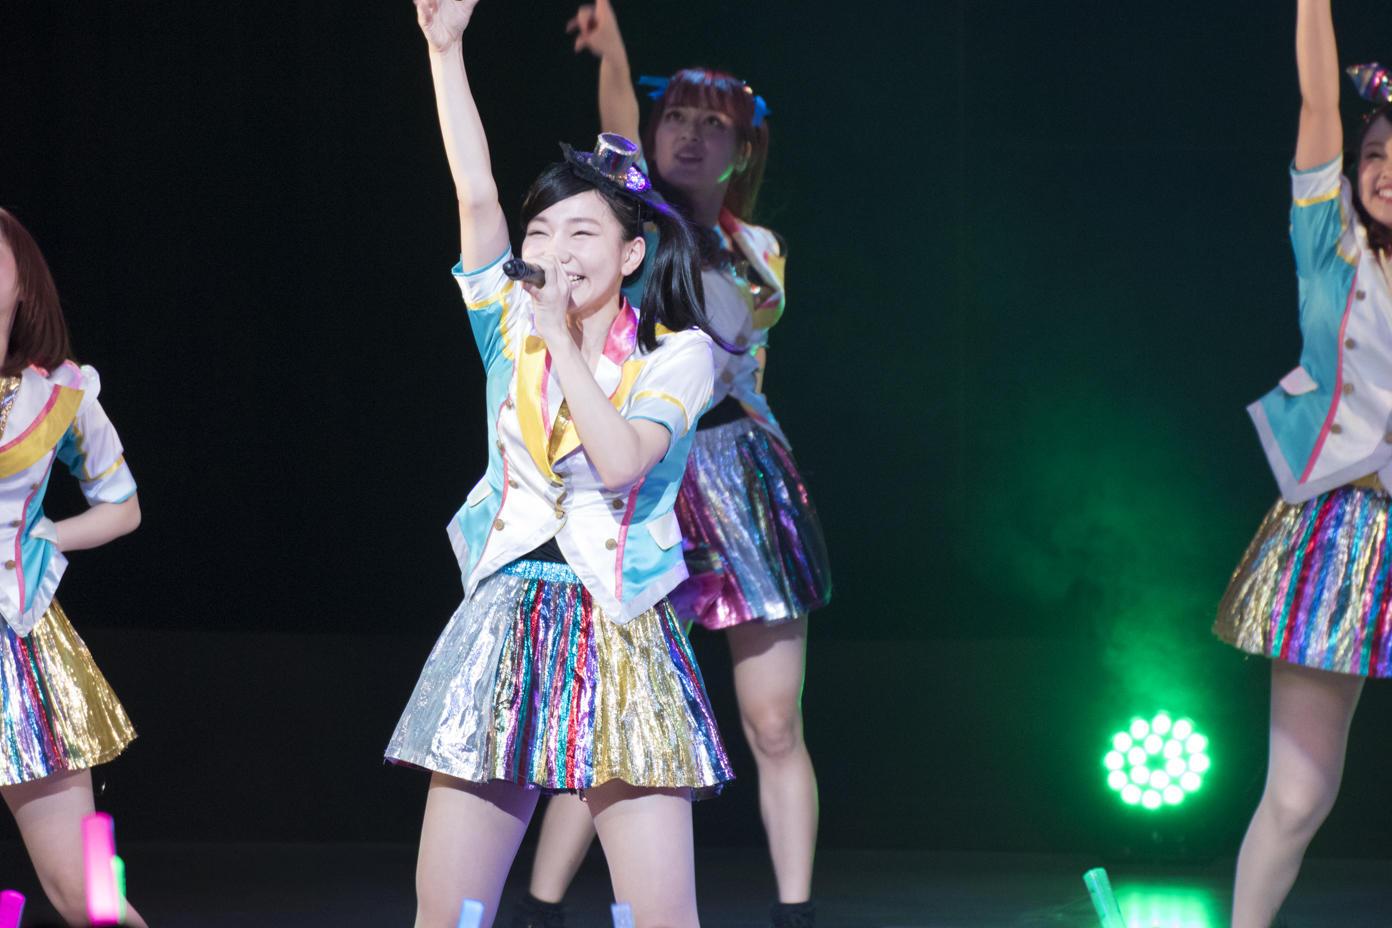 http://news.yoshimoto.co.jp/20161228122827-89461a20b355c074d606b9b47e90704de01002c9.jpg